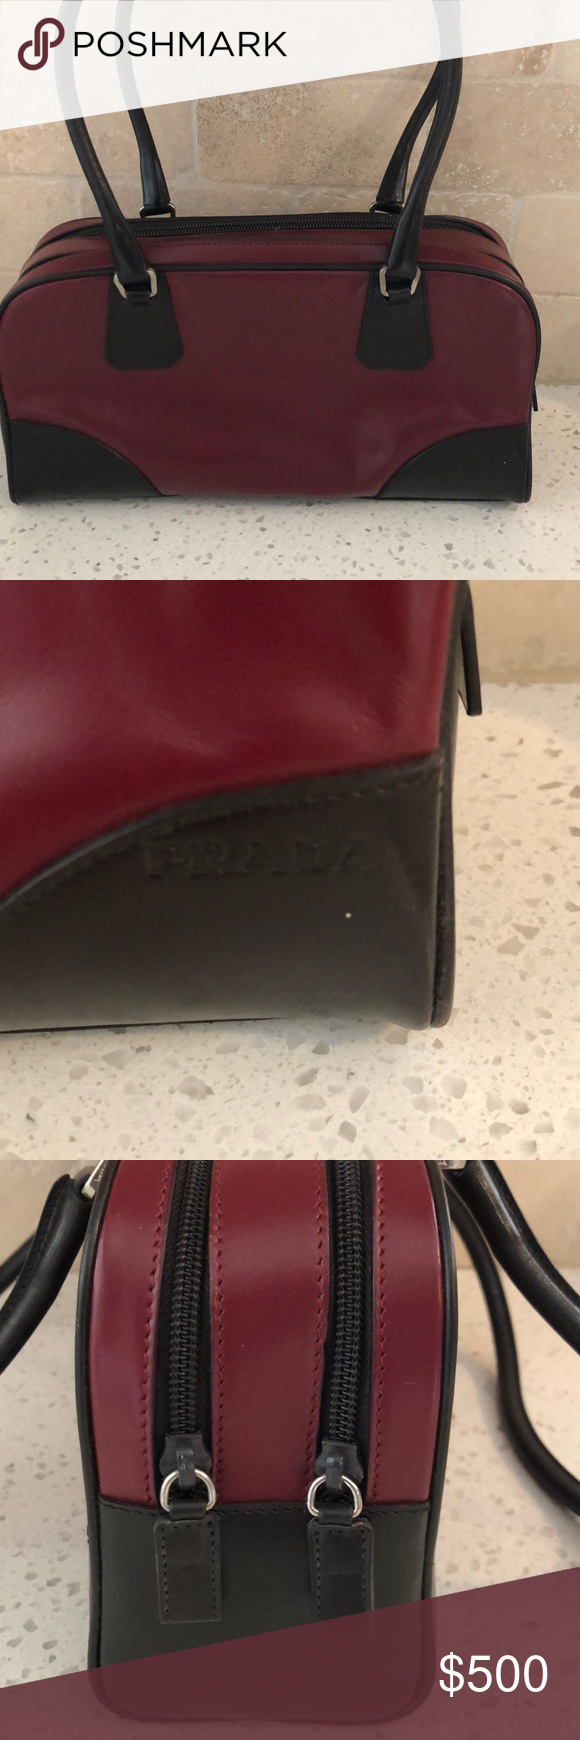 620f286423bc9 Prada shoulder bag. Wine color Gorgeous Prada shoulder bag. Wine color.  Used less than 5 times. In almost brand new condition Prada Bags Shoulder  Bags